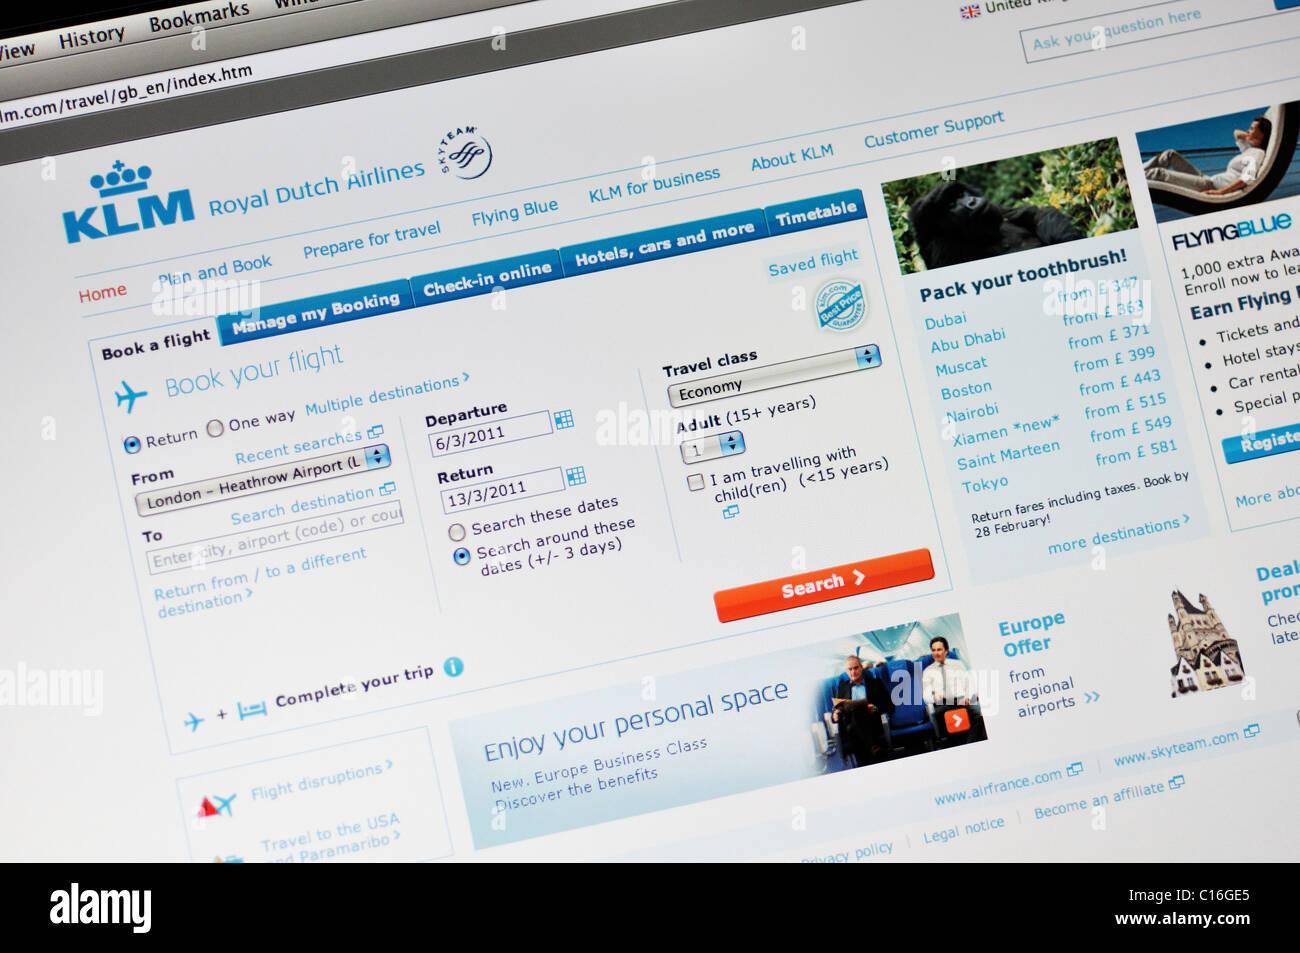 KLM Royal Dutch Airlines website - Stock Image